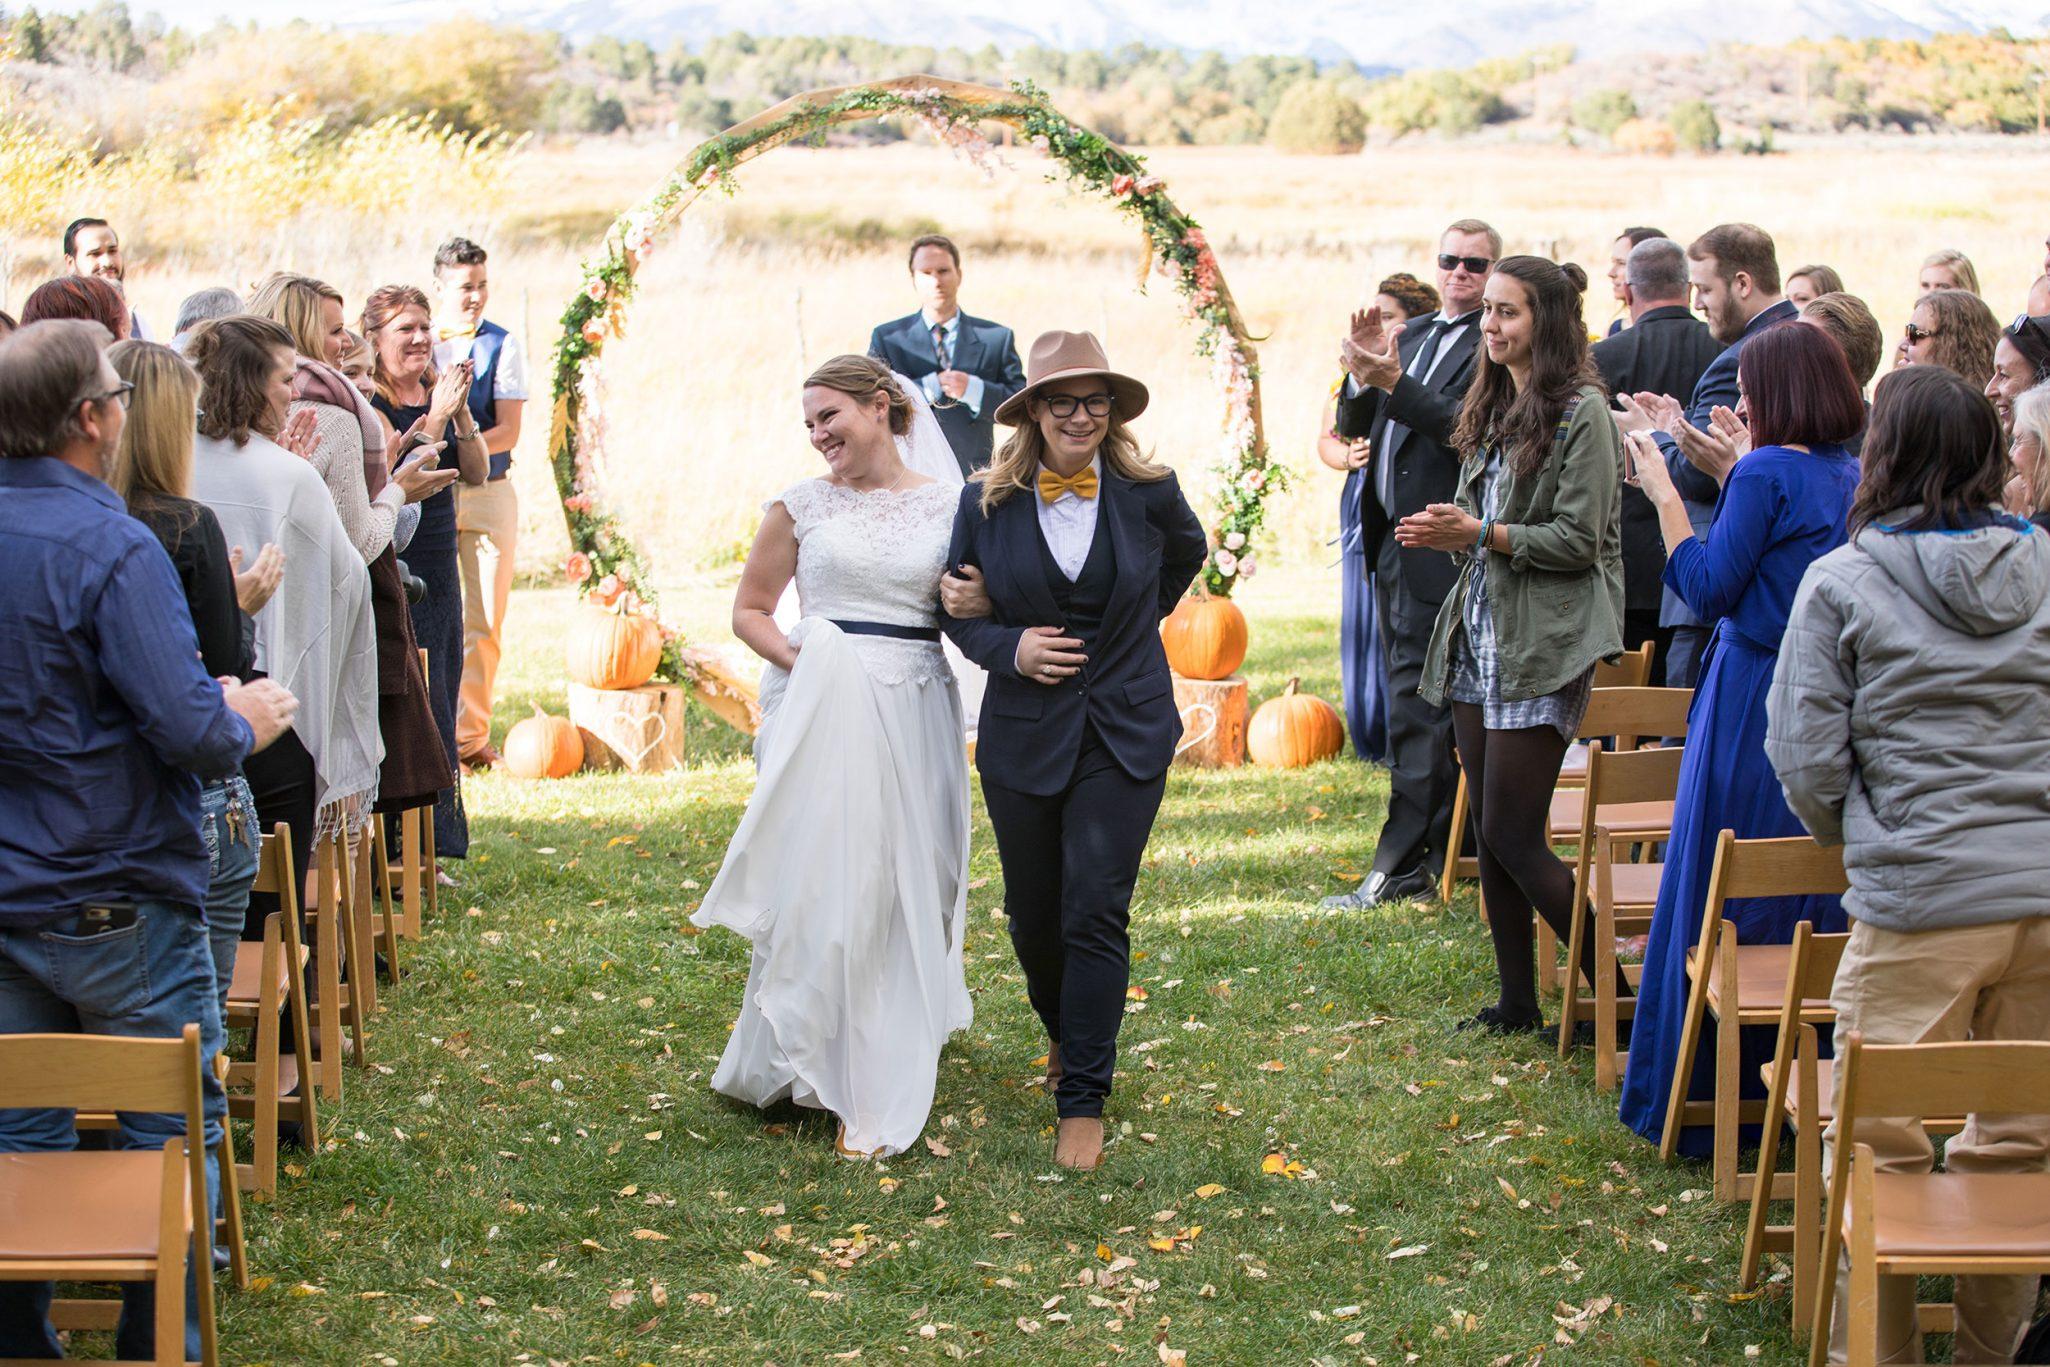 A same-sex autumn ceremony at Ridgewood Event Center, Durango Colorado